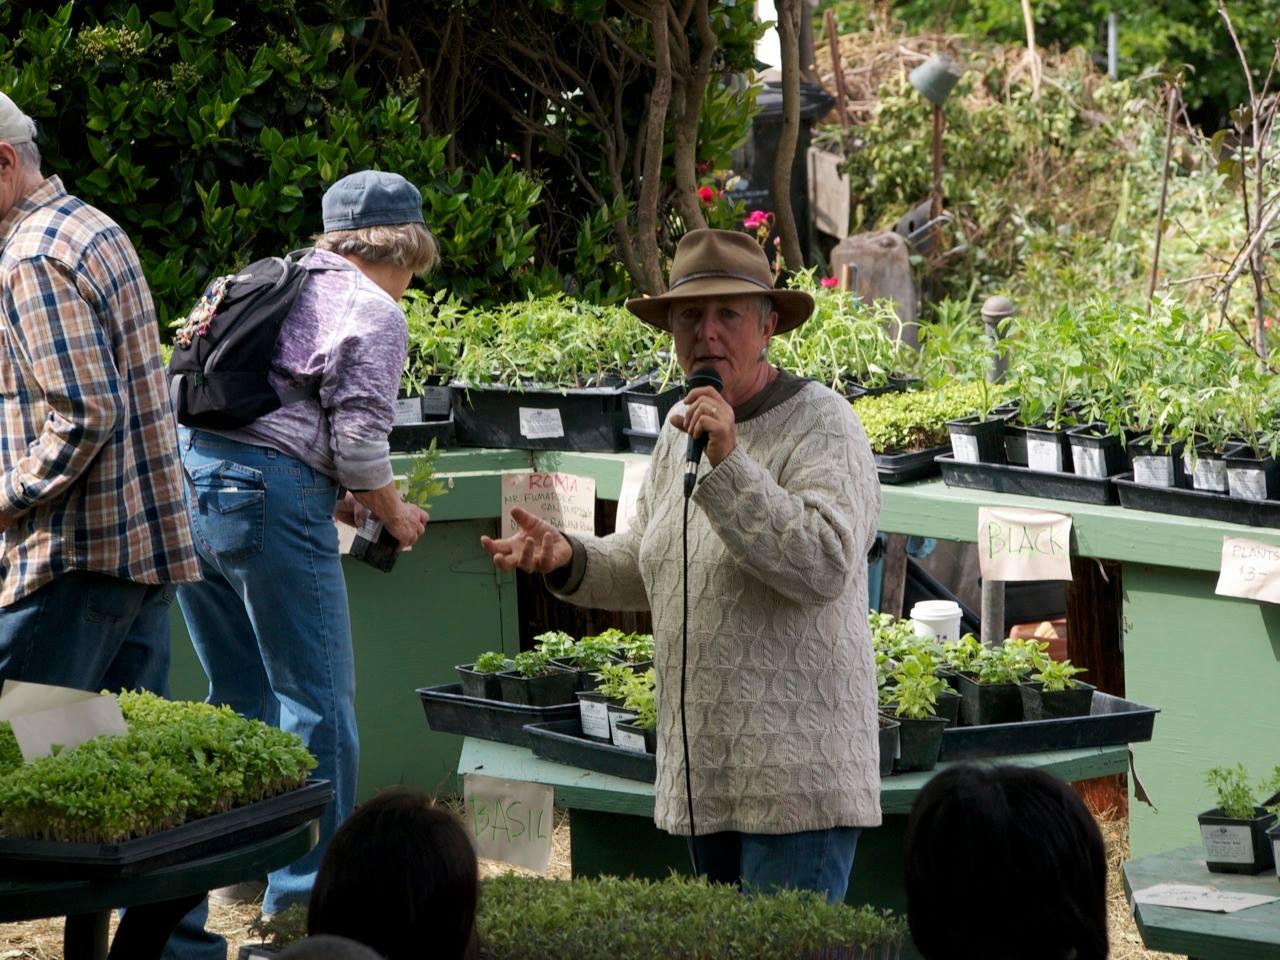 Barbara Spencer at Tomato-bration